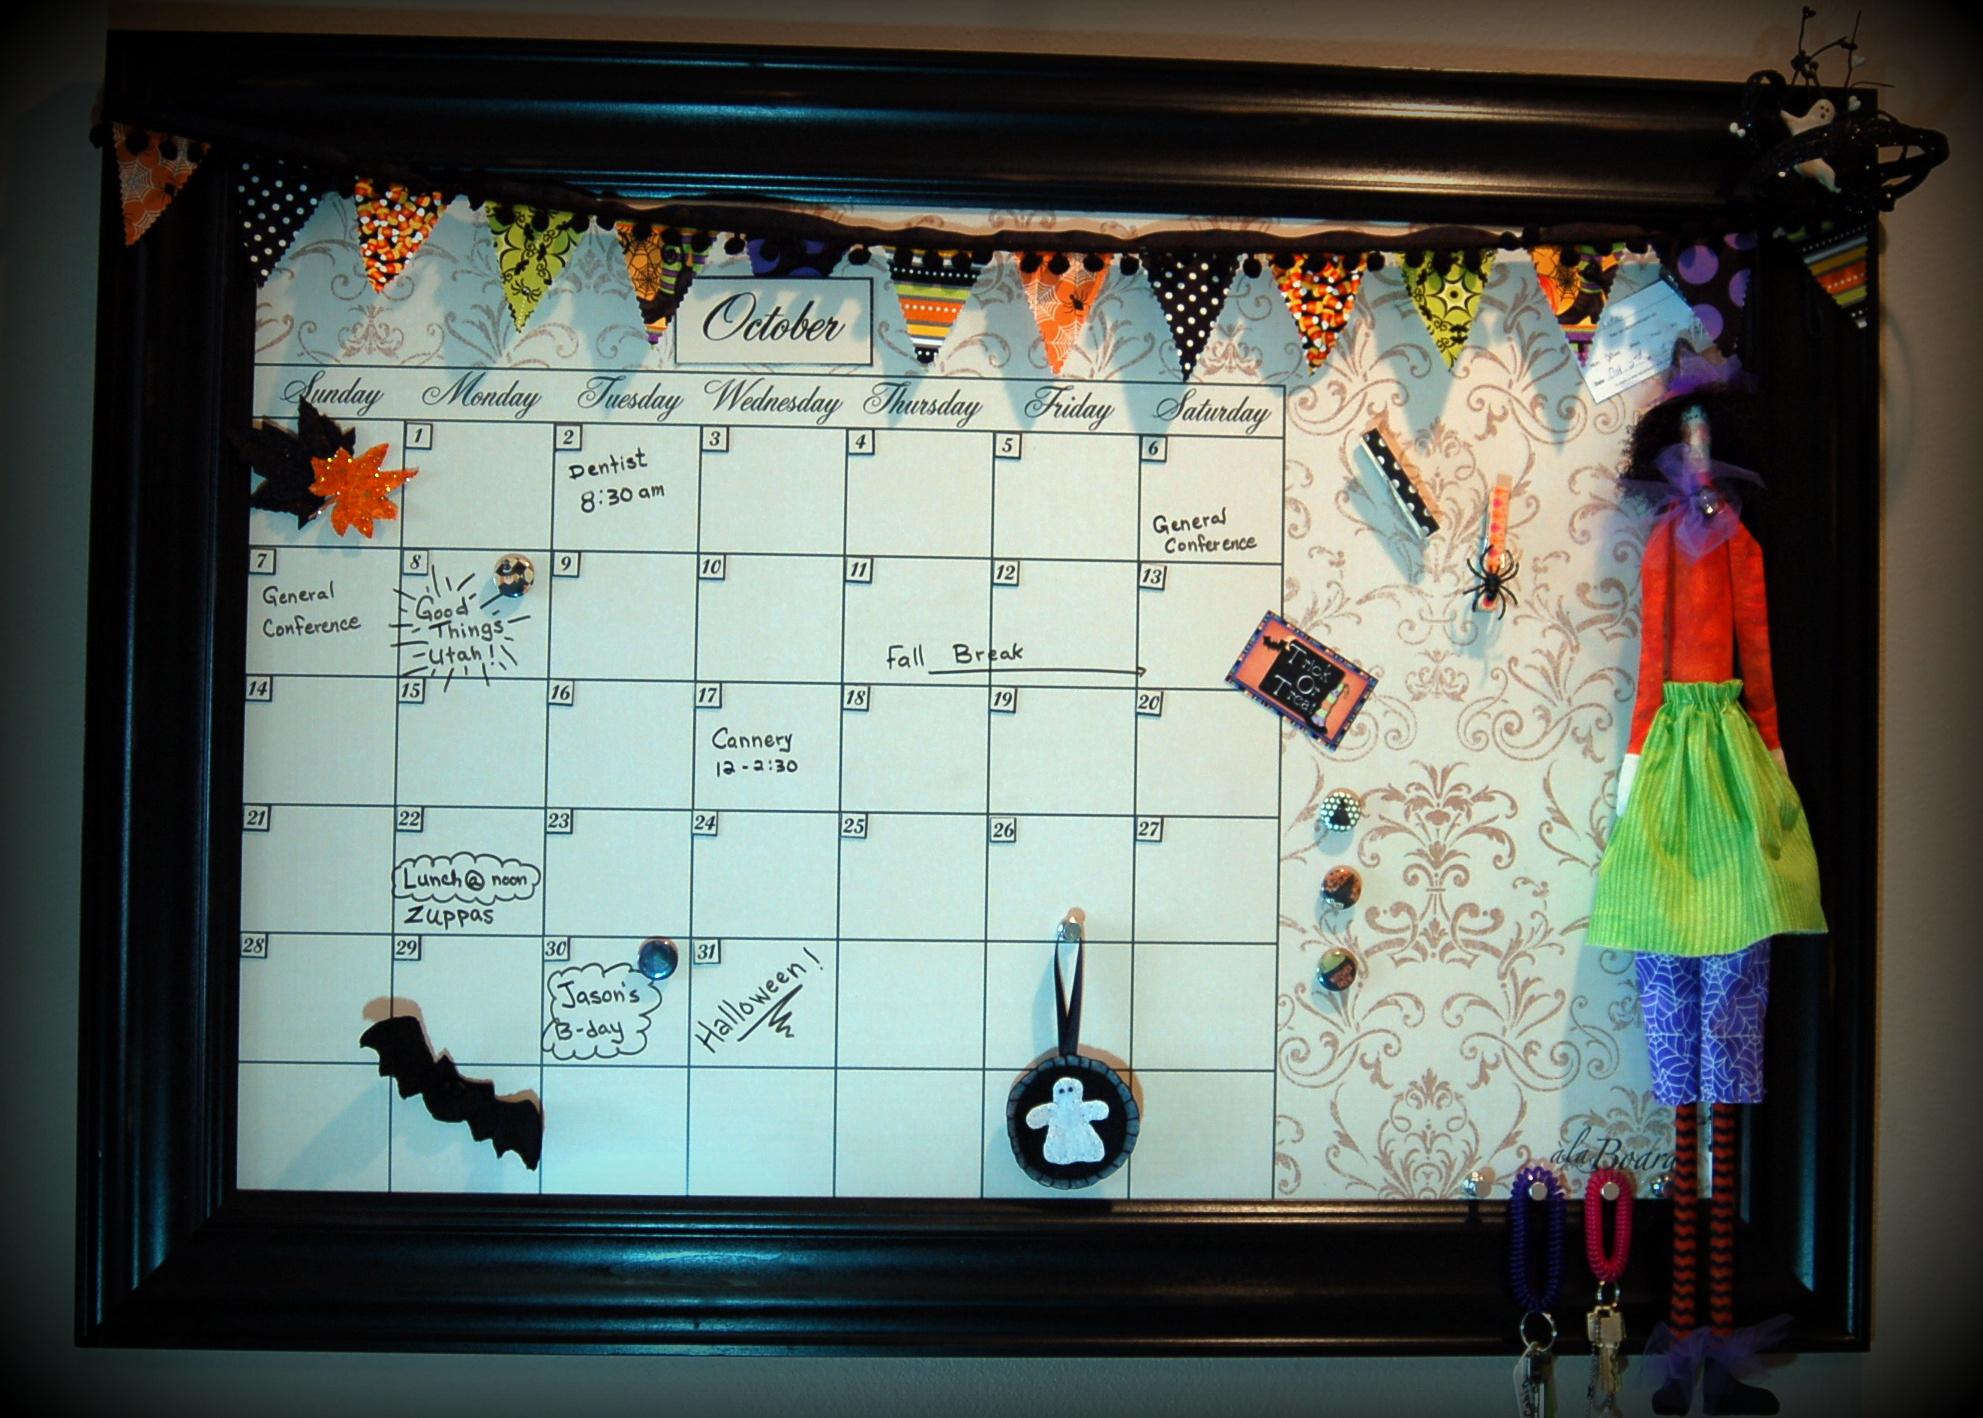 Oct calendar decorations Archives  Pink Polka Dot Creations - October Decorations